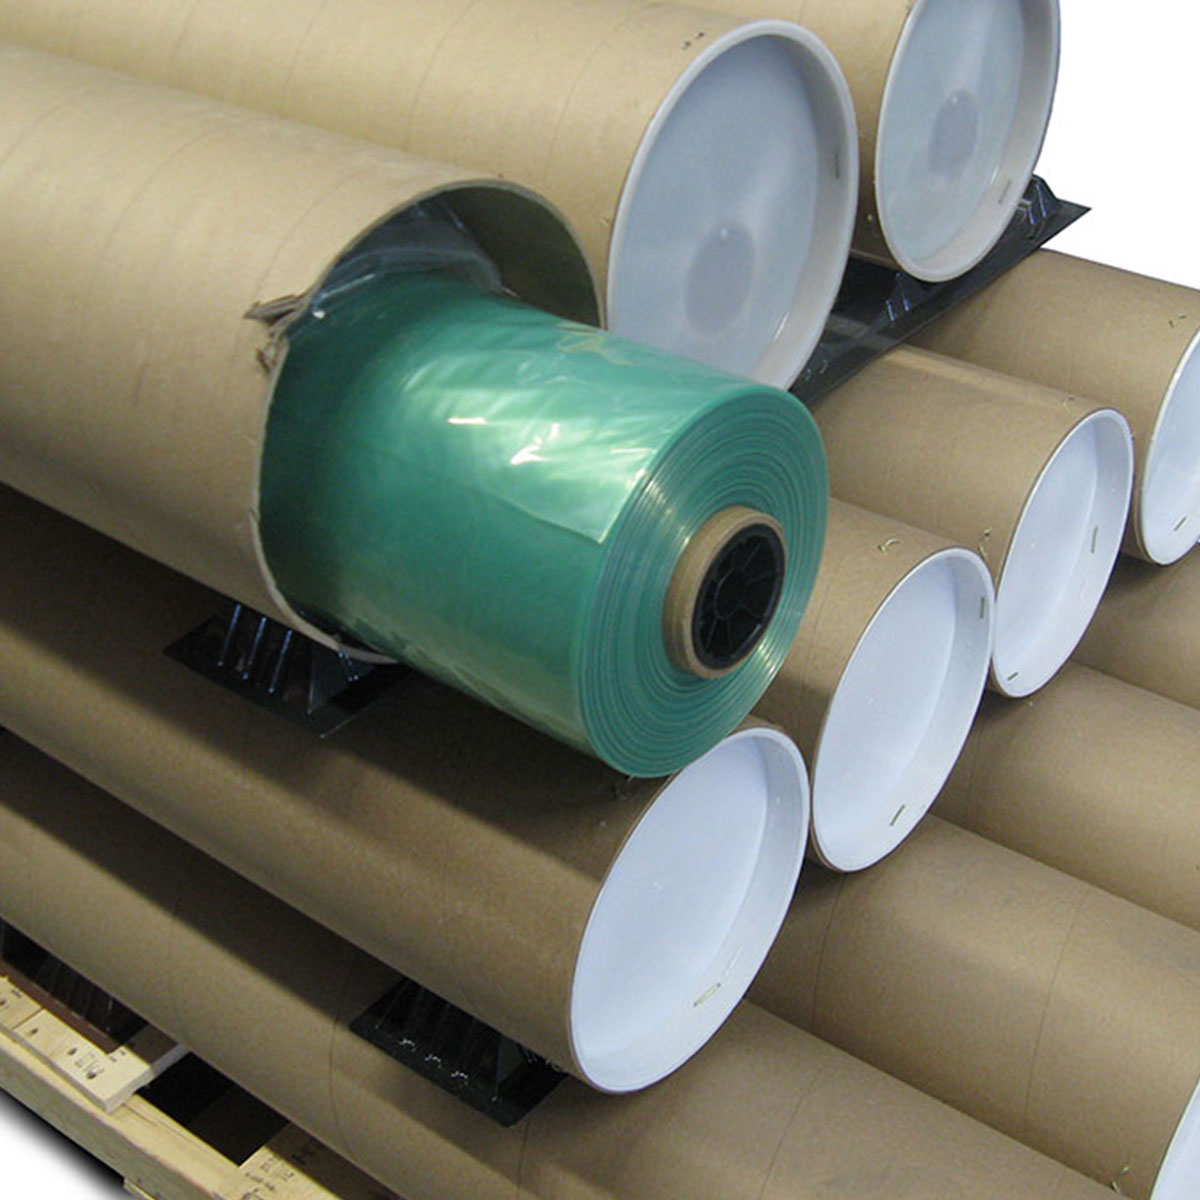 vacuum bag nylon 910 green lft 0076mm x 910mm 4004m 0003 x 36